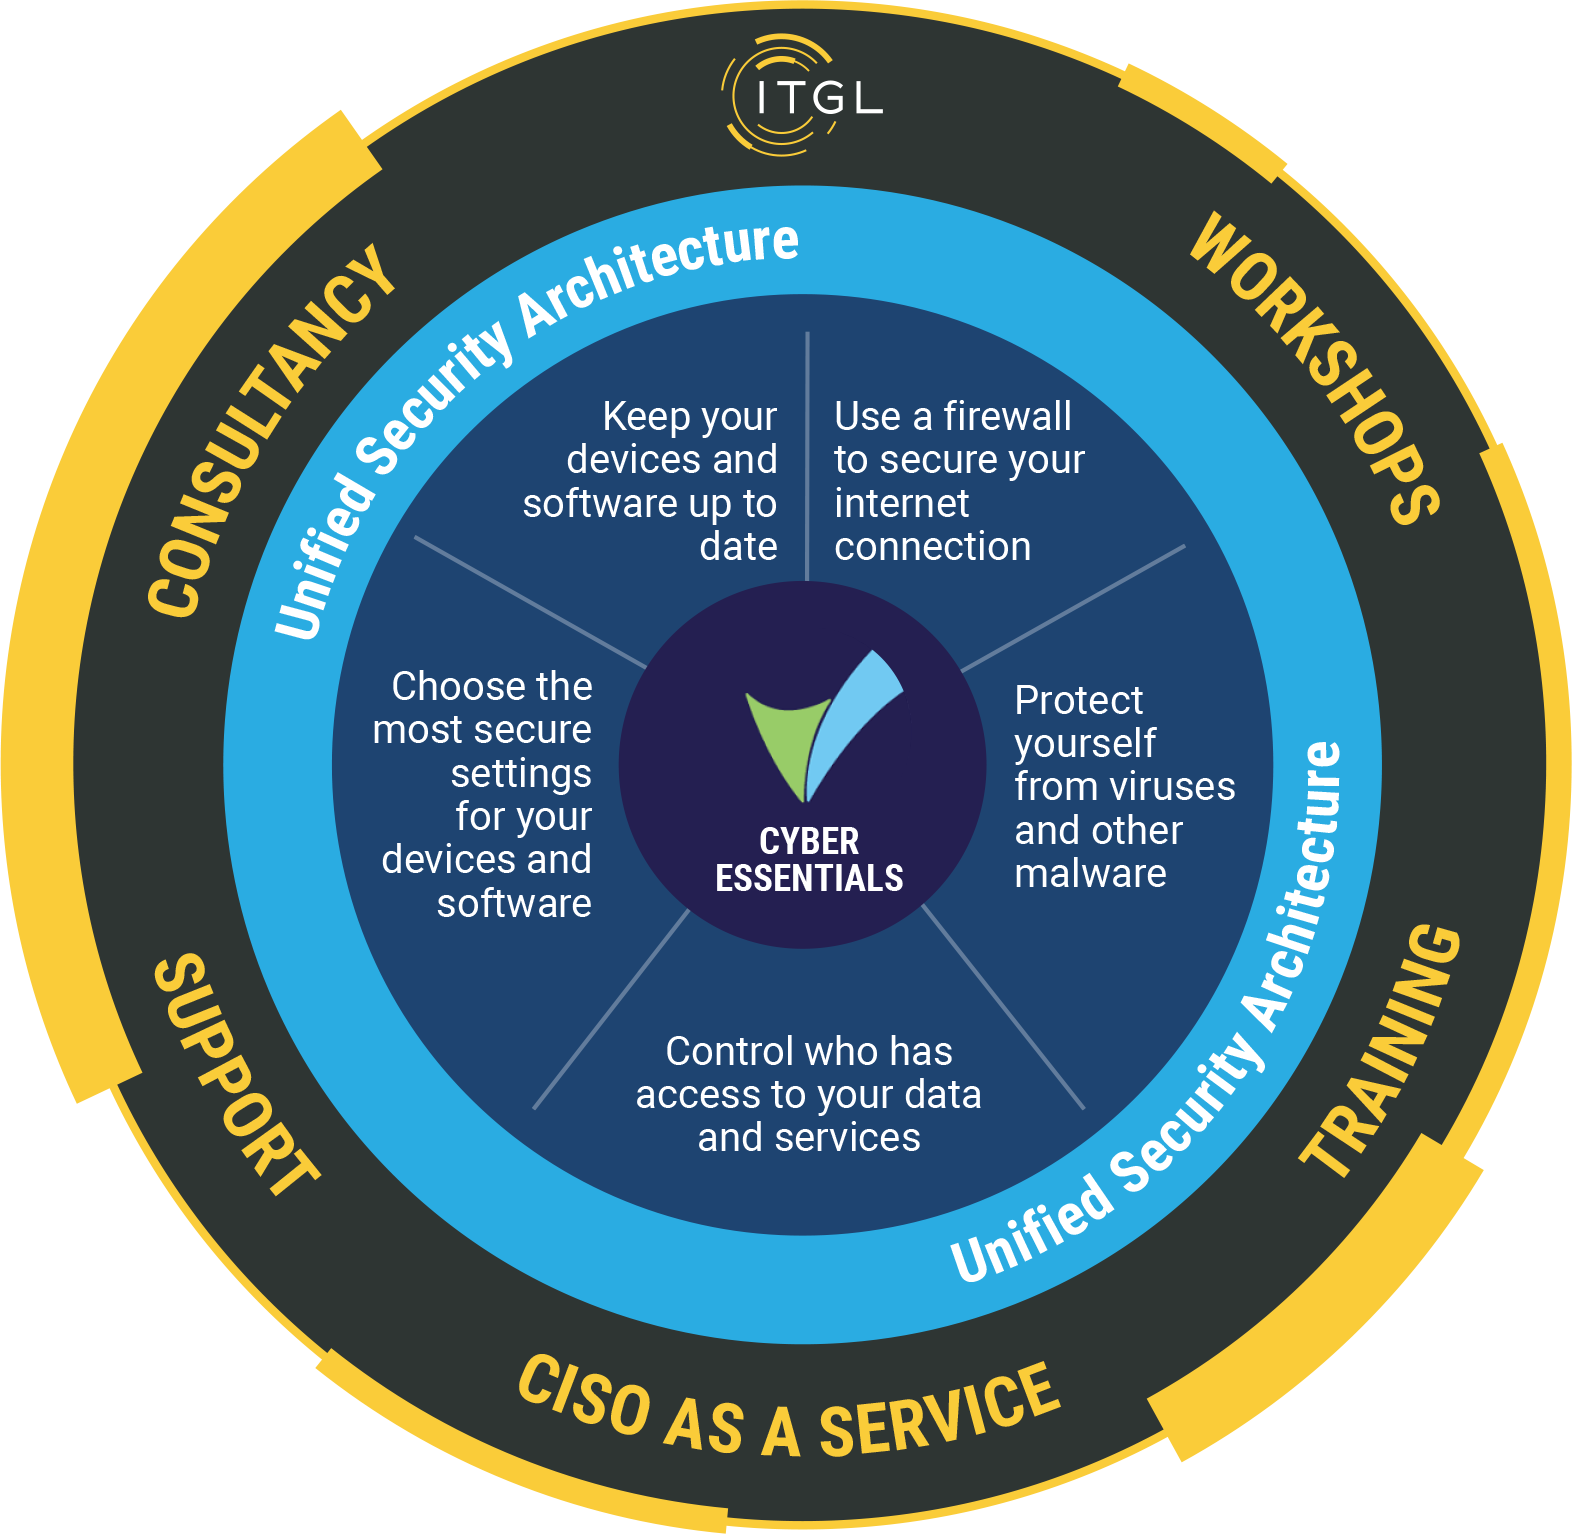 ITGL CyberSecurity Guidance 2020-7